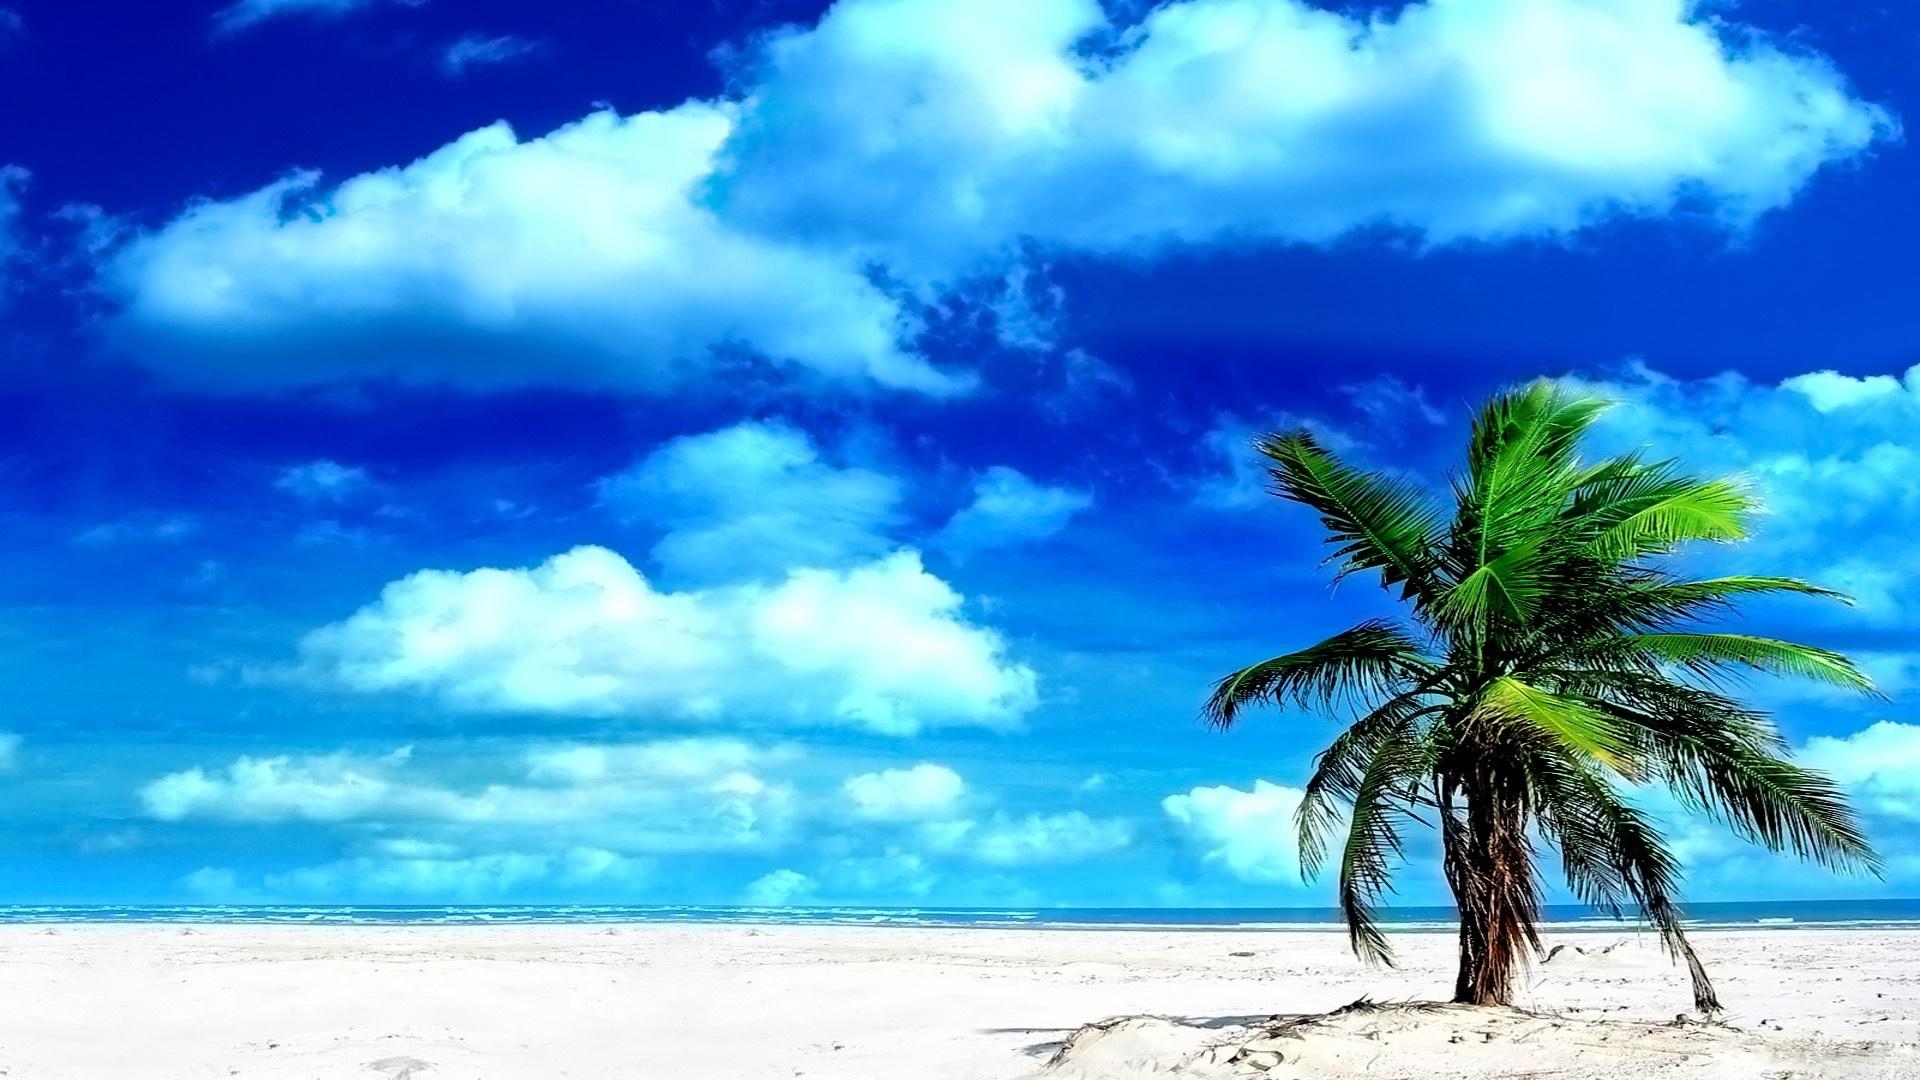 Paradise Island wallpaper   738906 1920x1080